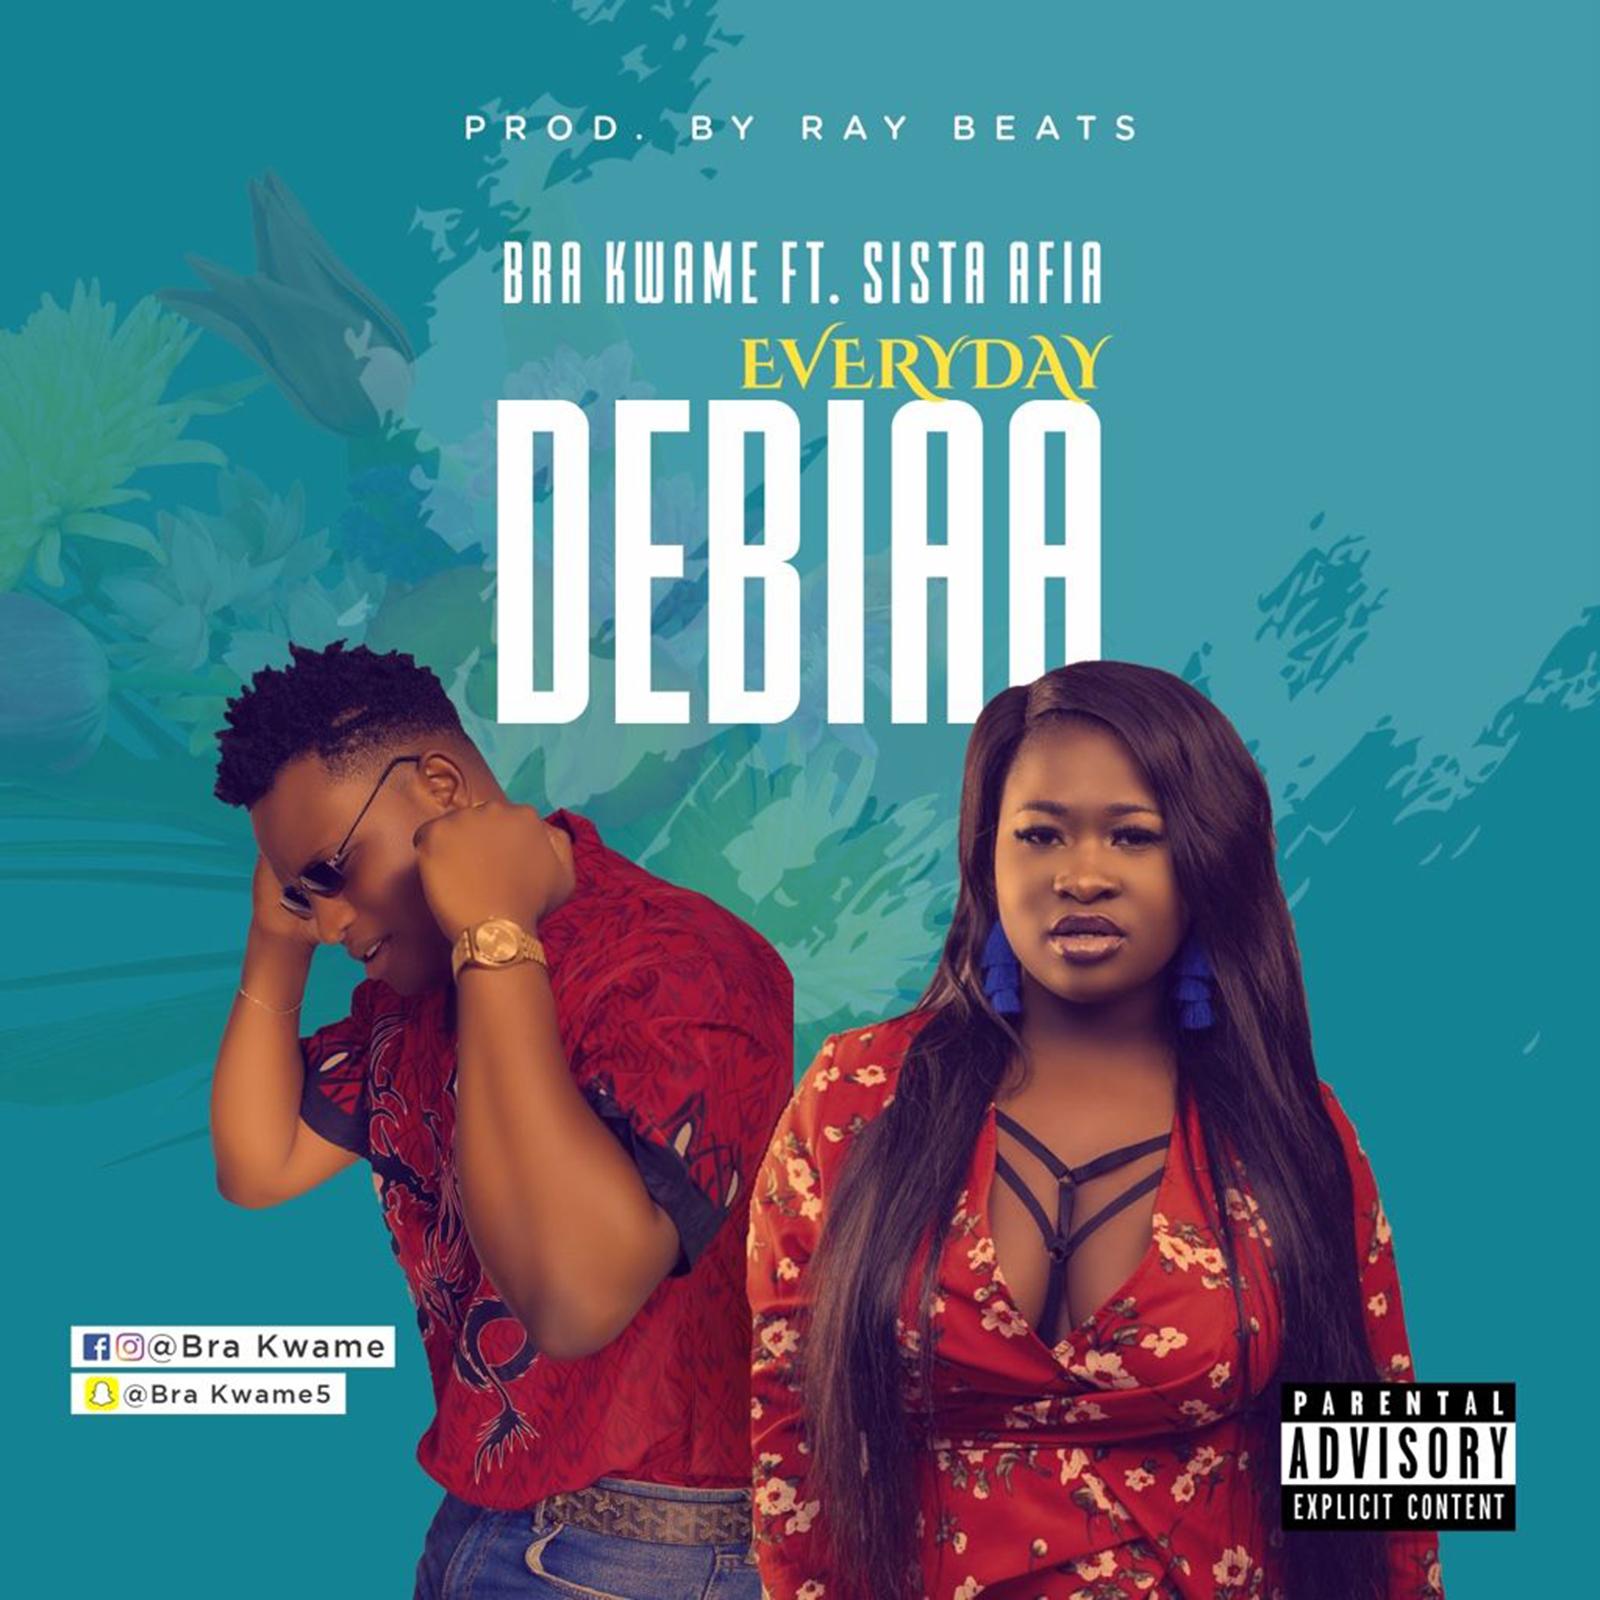 Debiaa(Everyday) by Bra Kwame feat. Sista Afia